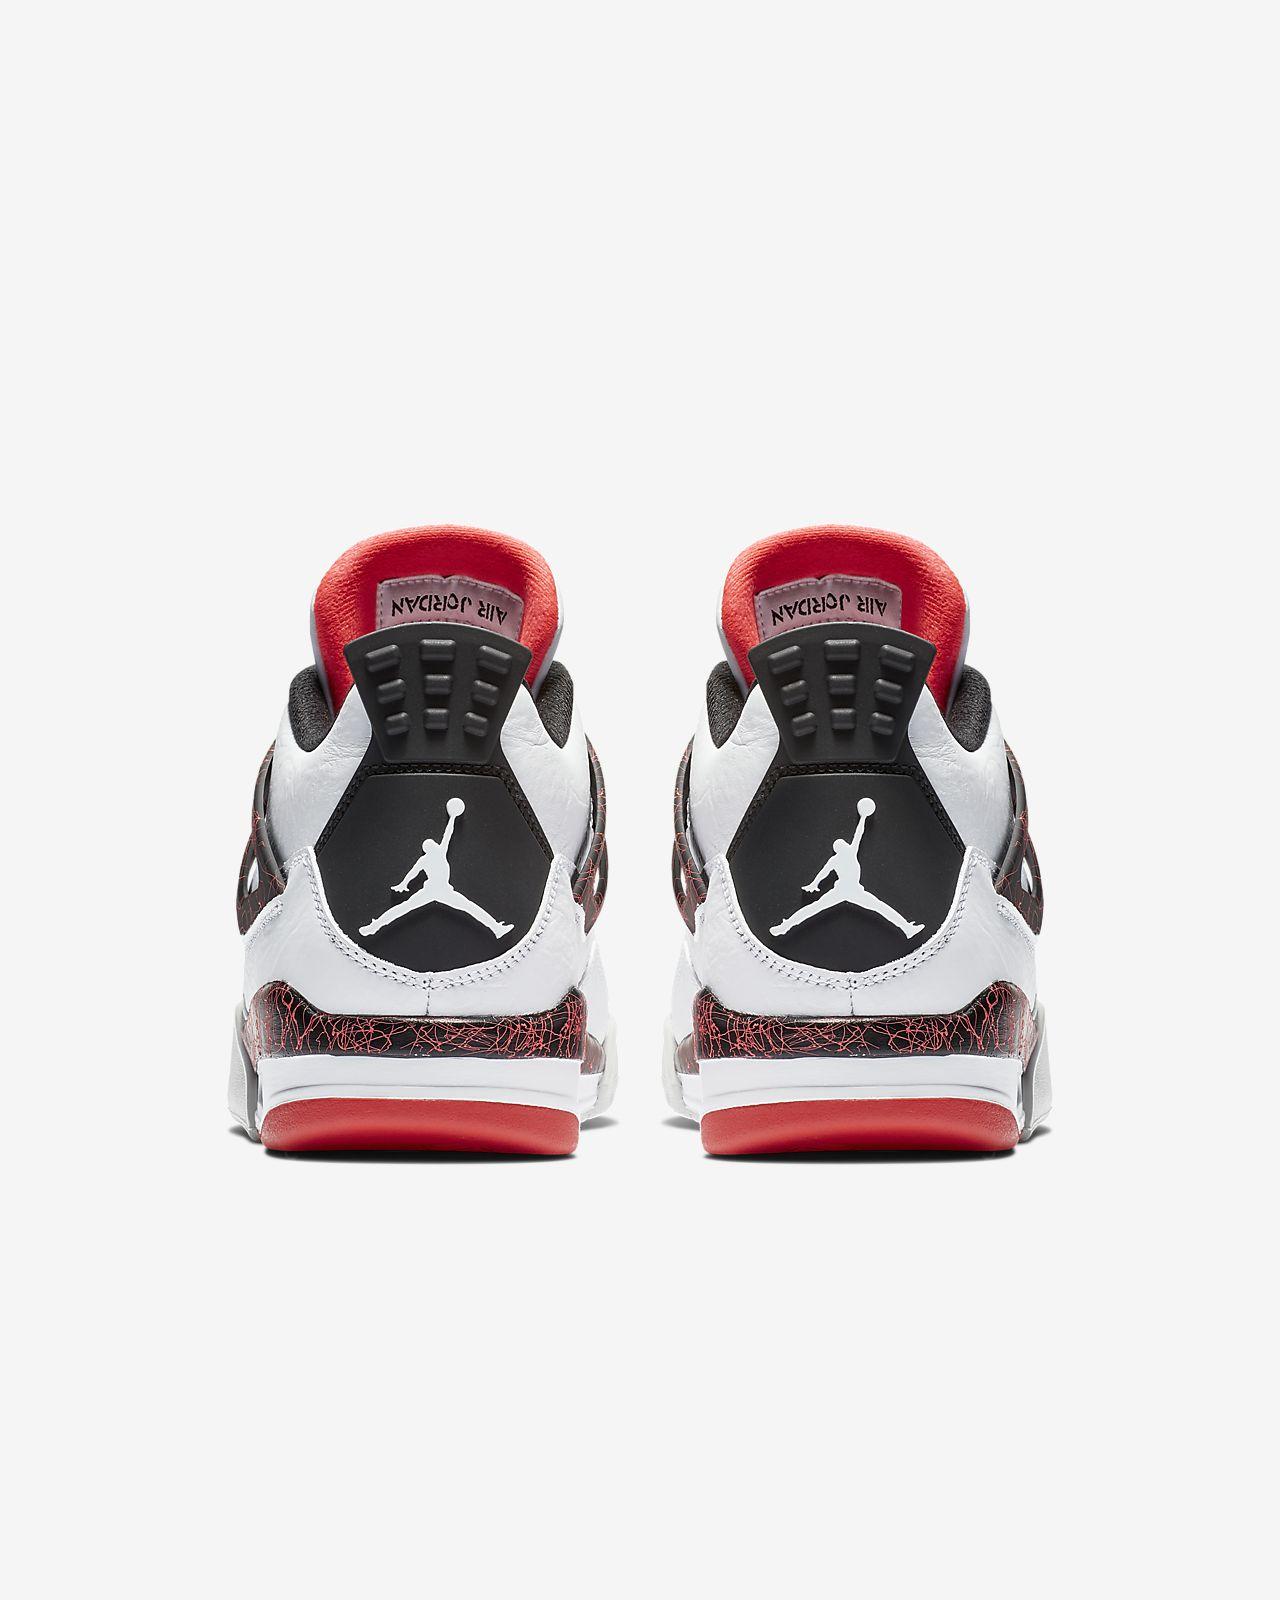 quality design 954f0 5ce14 ... Air Jordan 4 Retro Men s Shoe